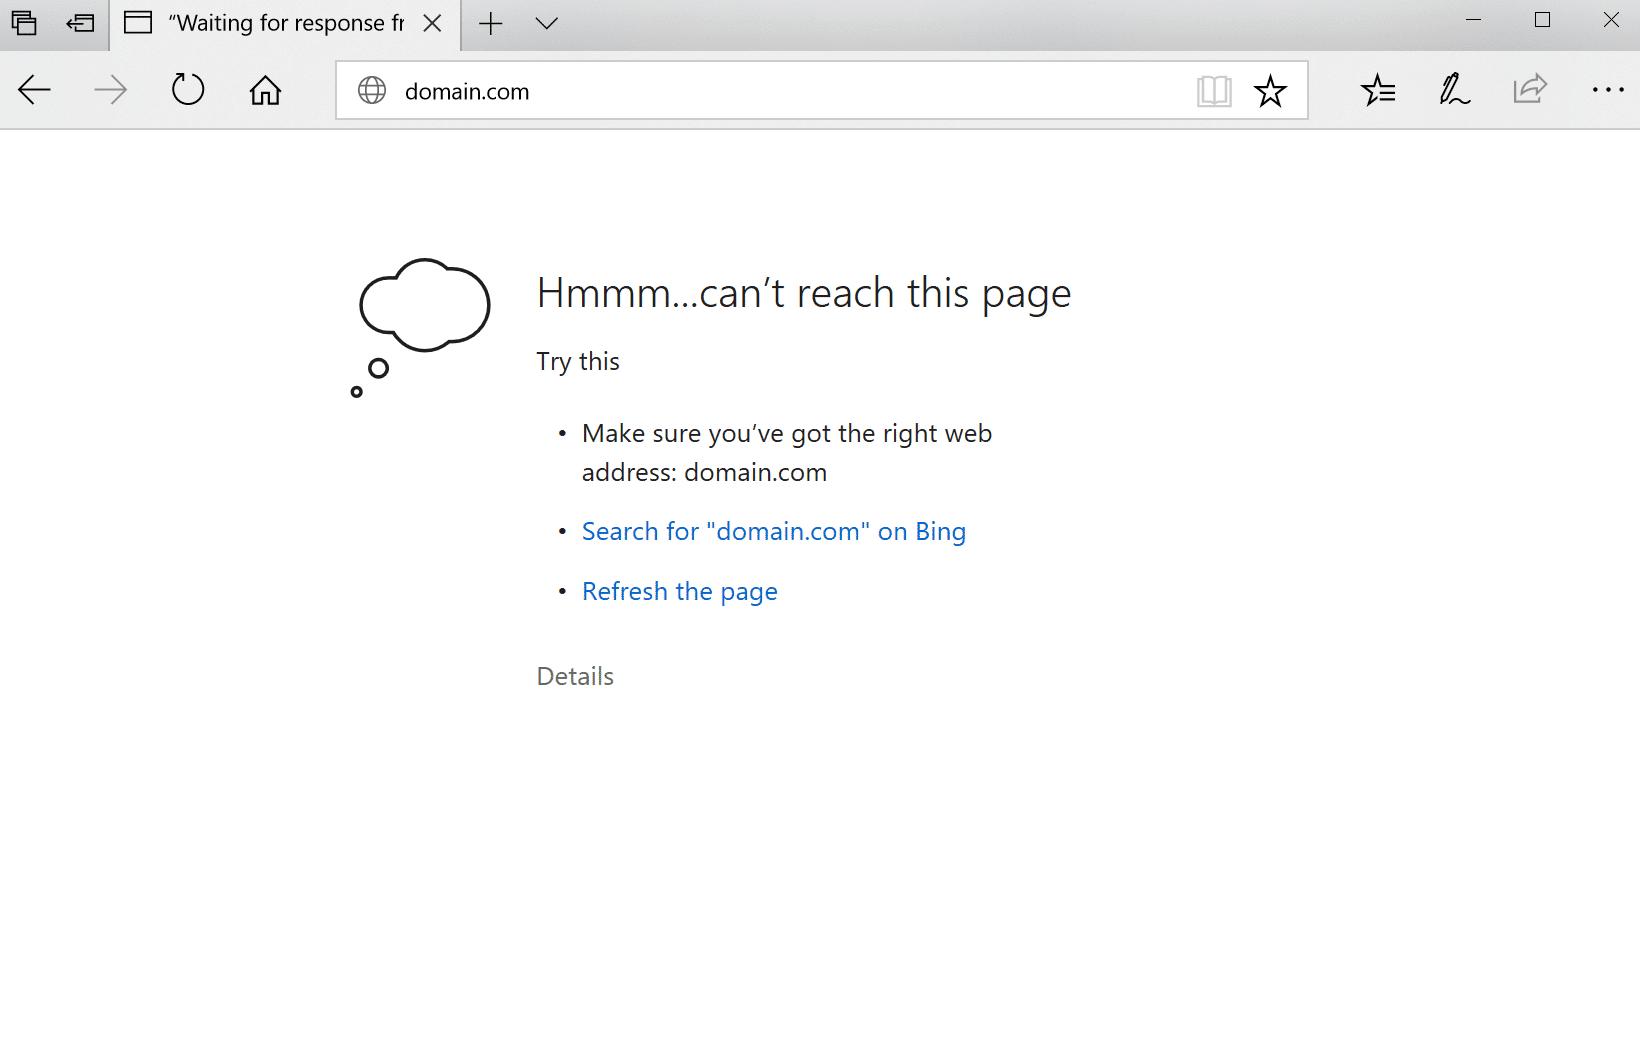 ERR_CONNECTION_REFUSED error in Microsoft Edge